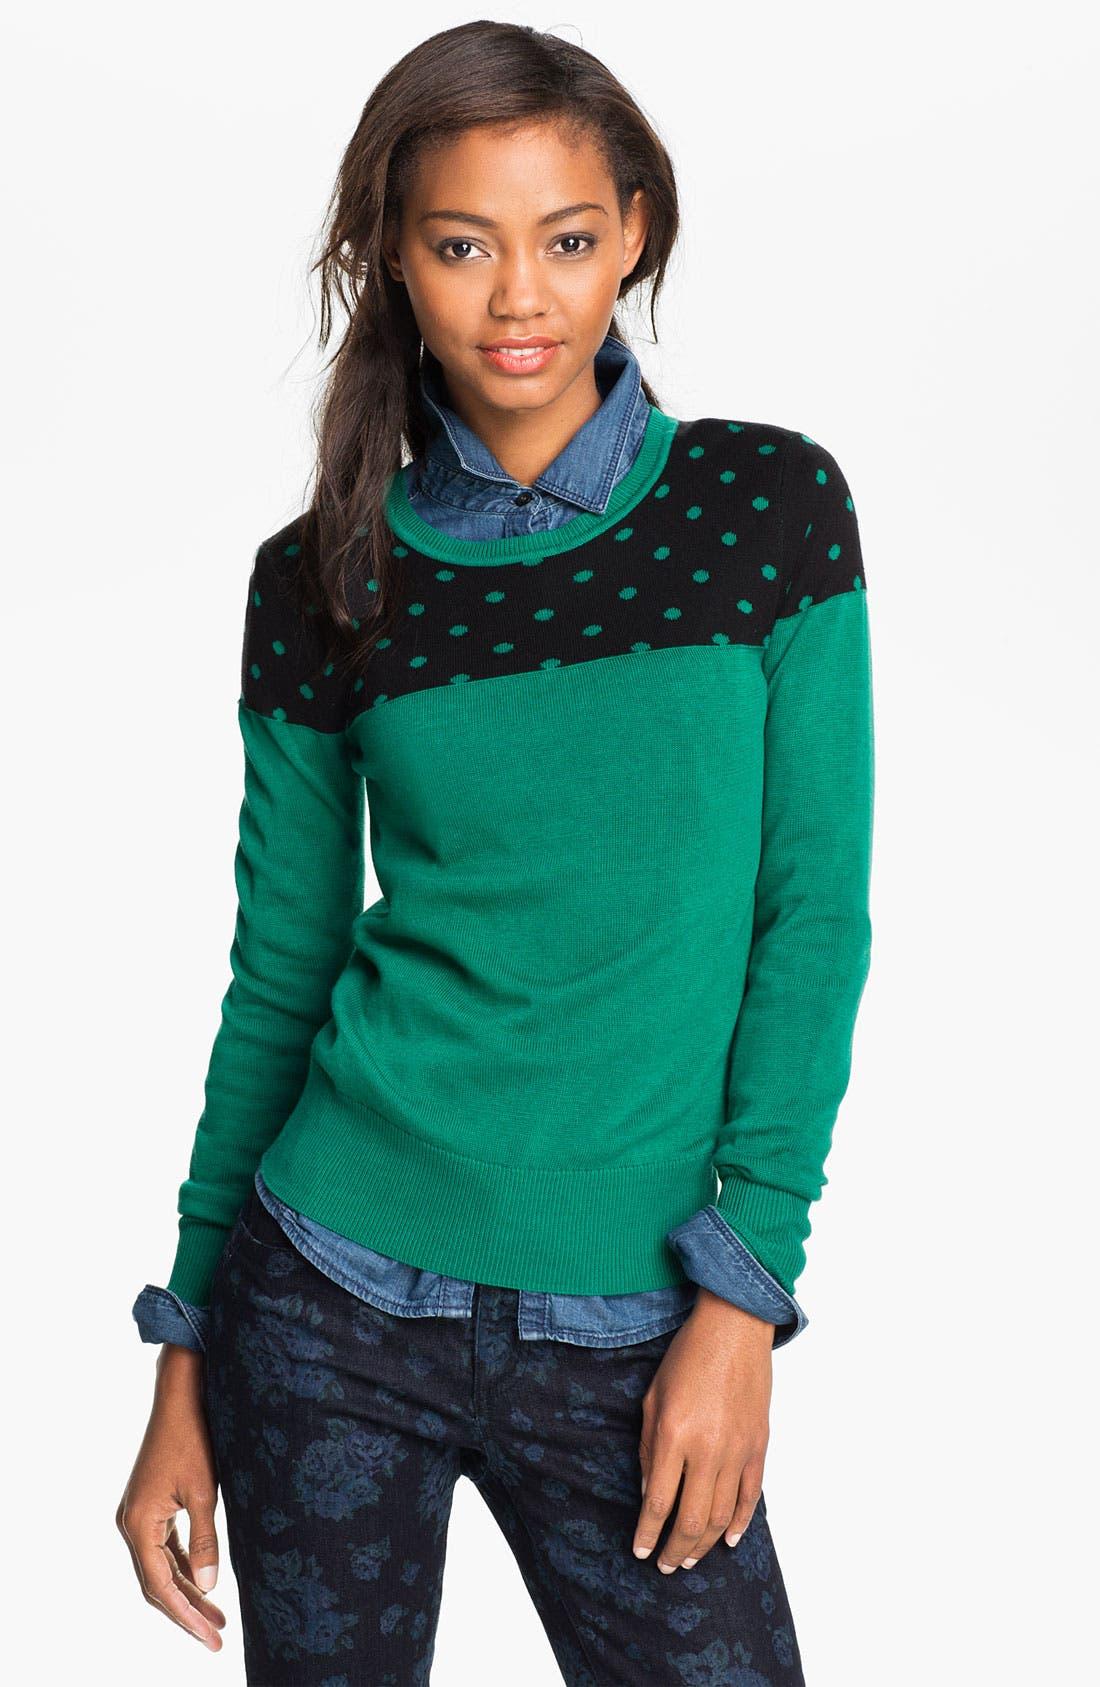 Alternate Image 1 Selected - Caslon® Patterned Crewneck Sweater